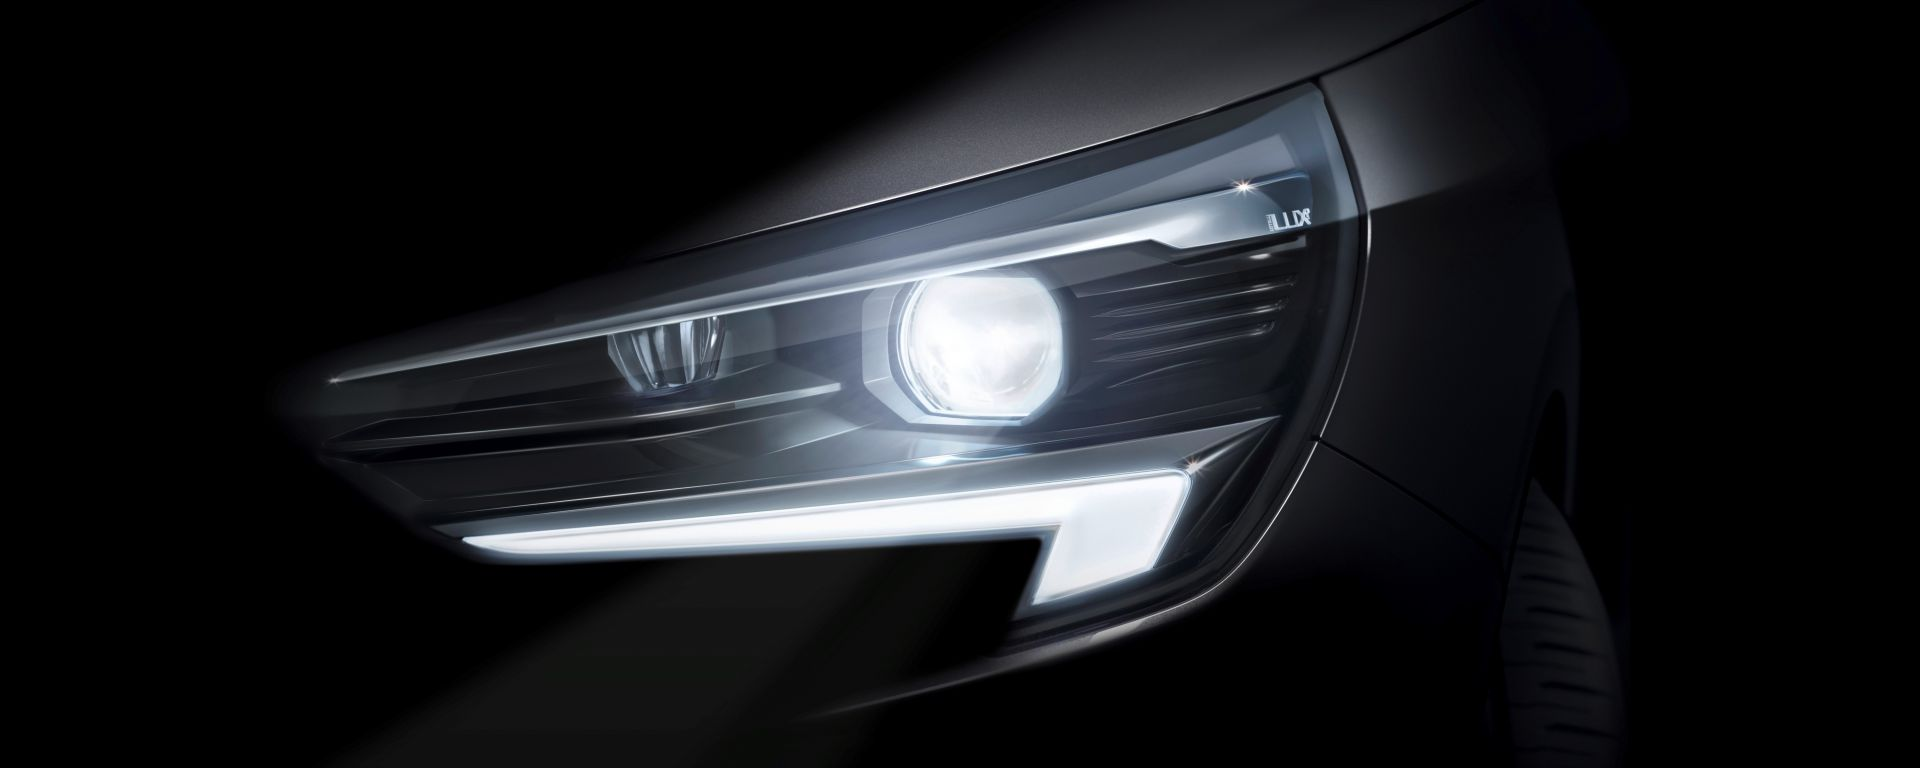 Opel Corsa 2019: avrà i fari matrix LED